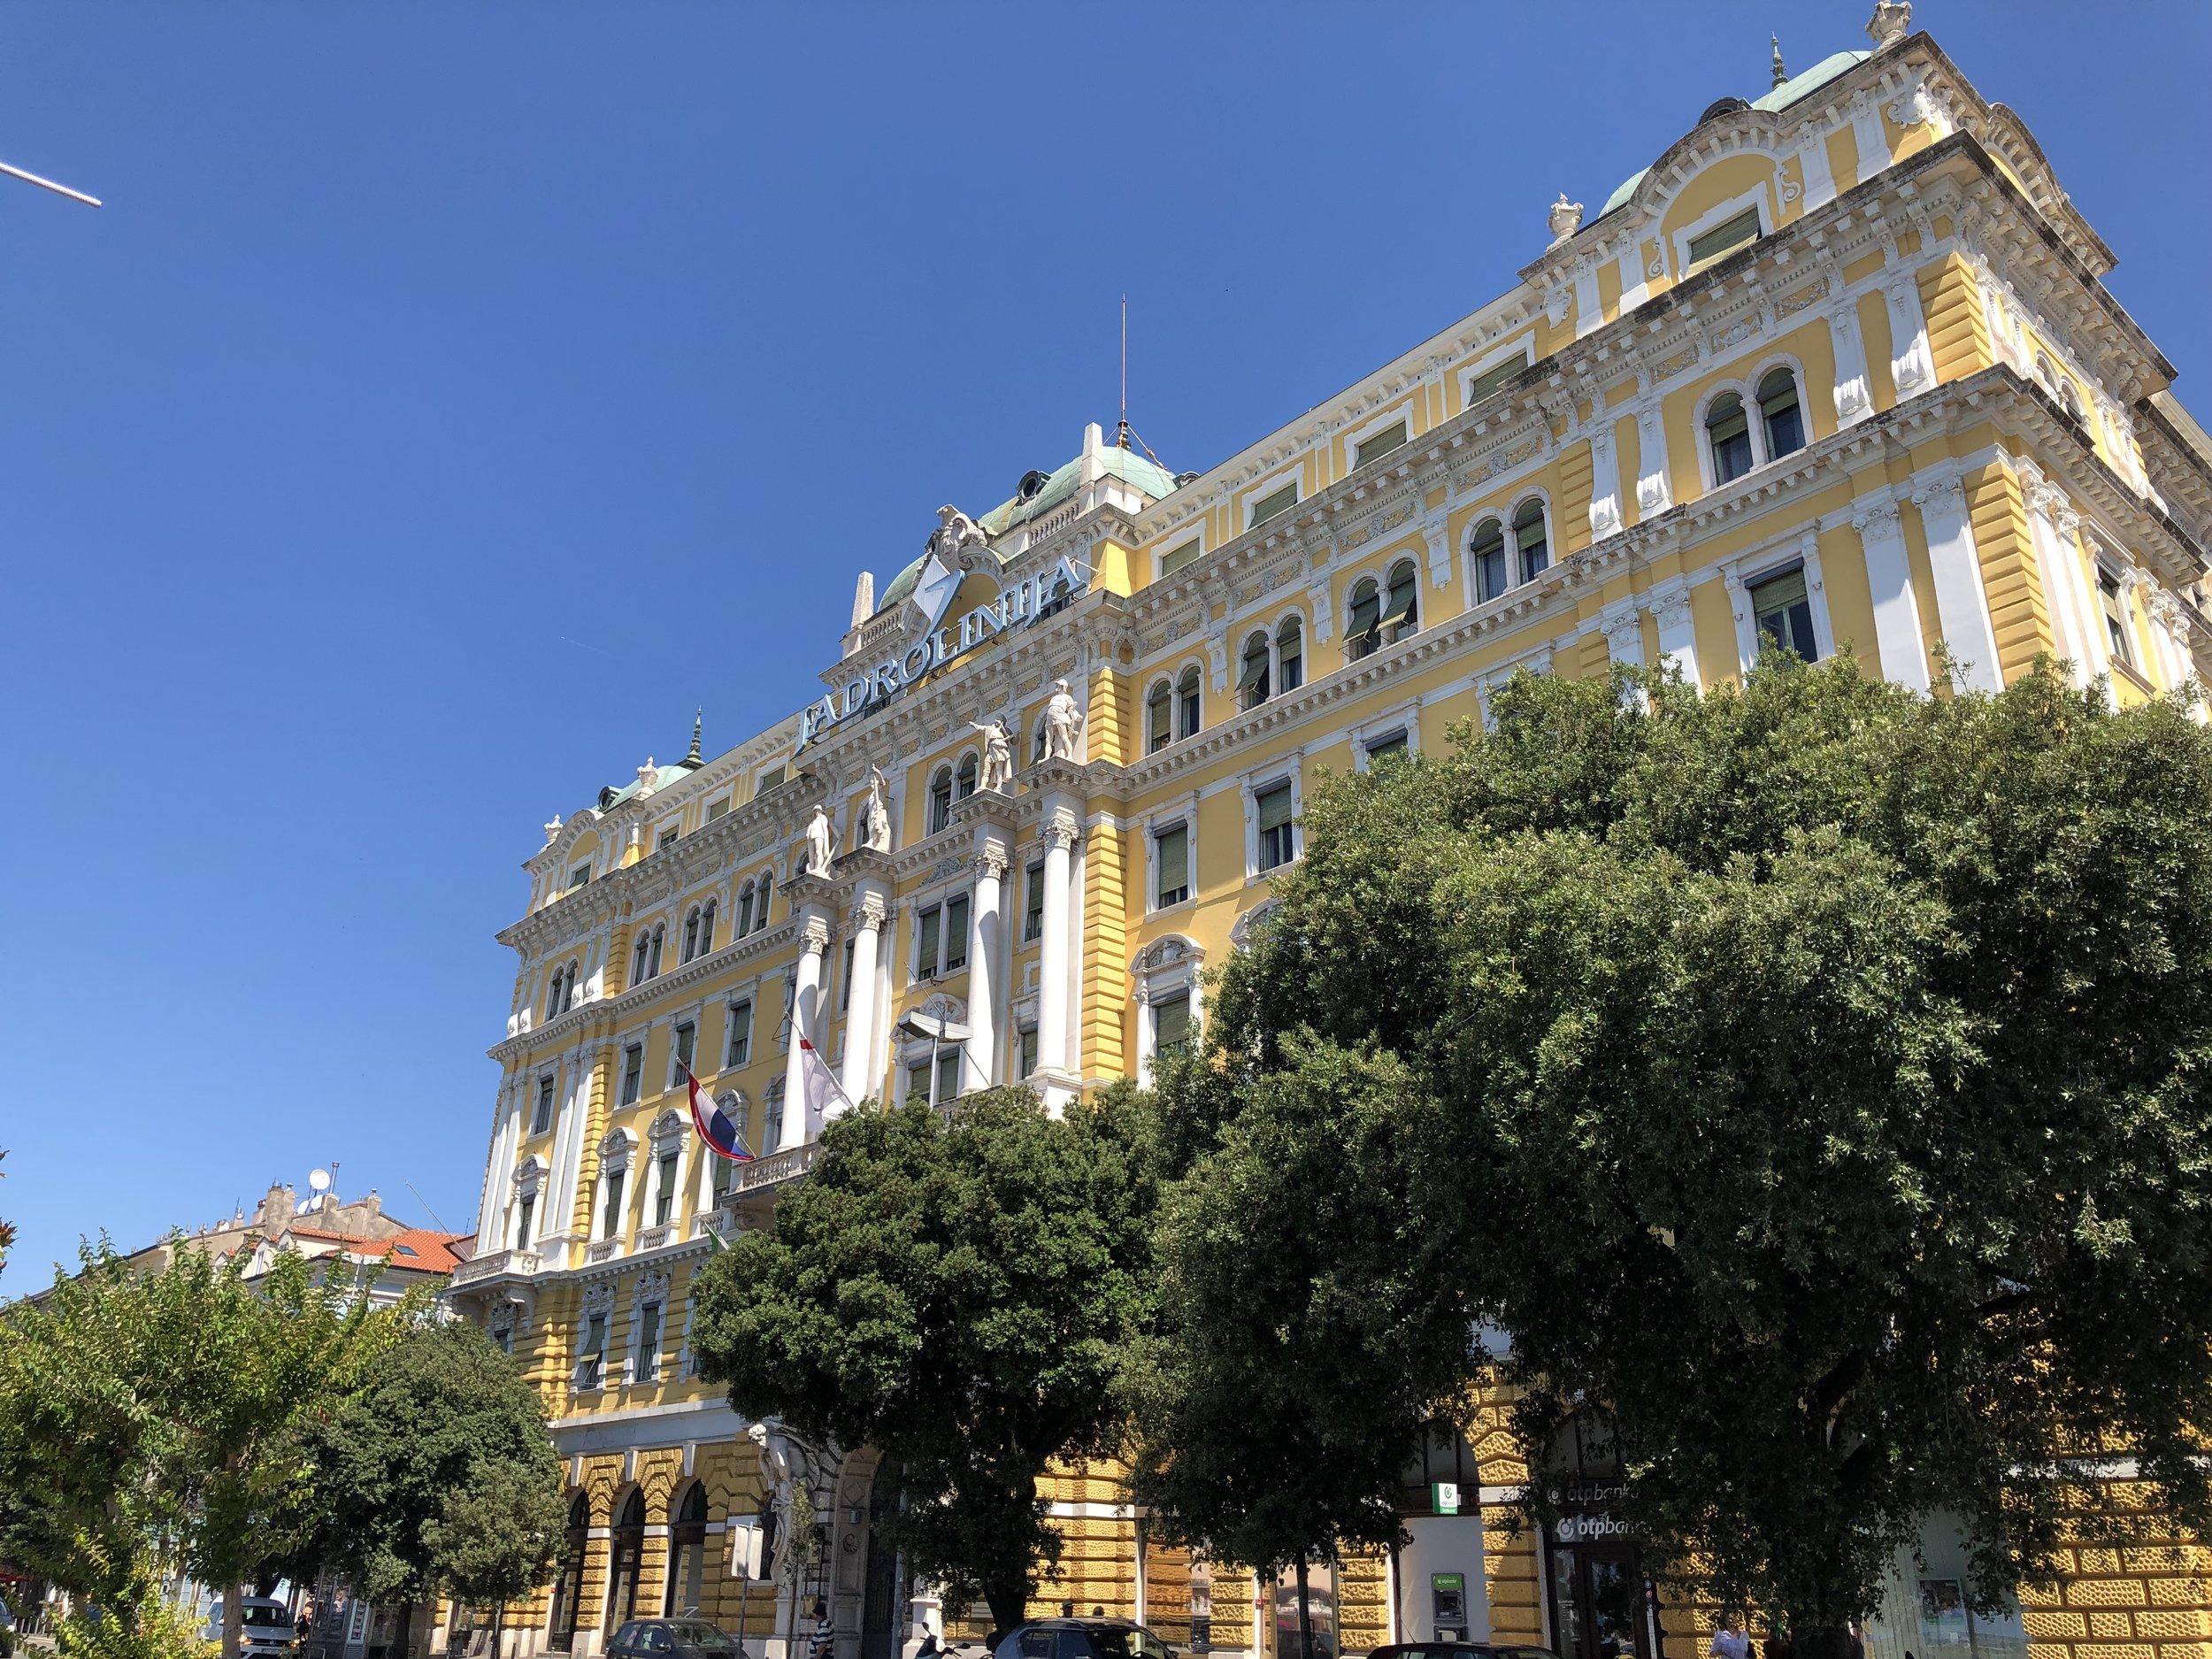 Rijeka in Croatia.